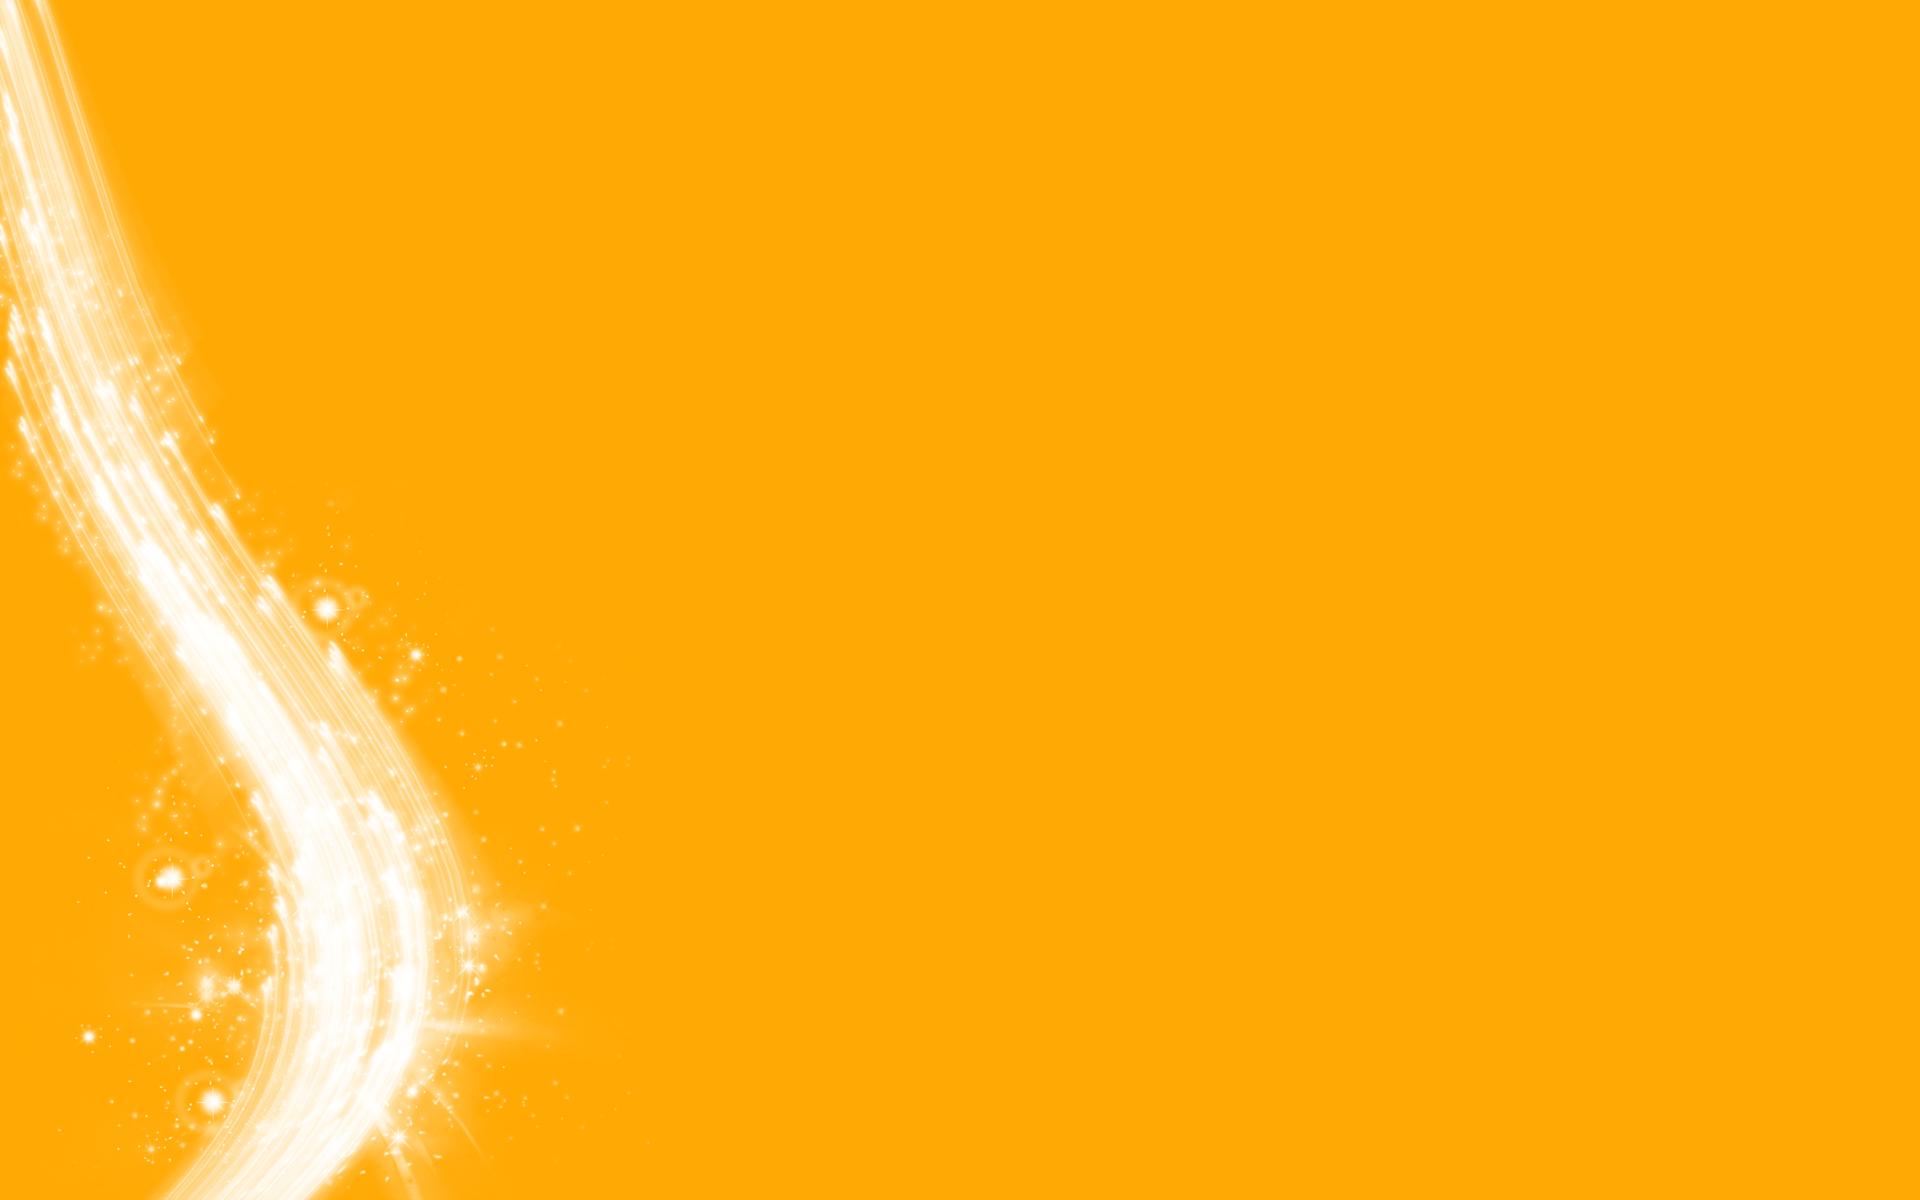 1920x1200 Orange patterns desktop PC and Mac wallpaper 1920x1200